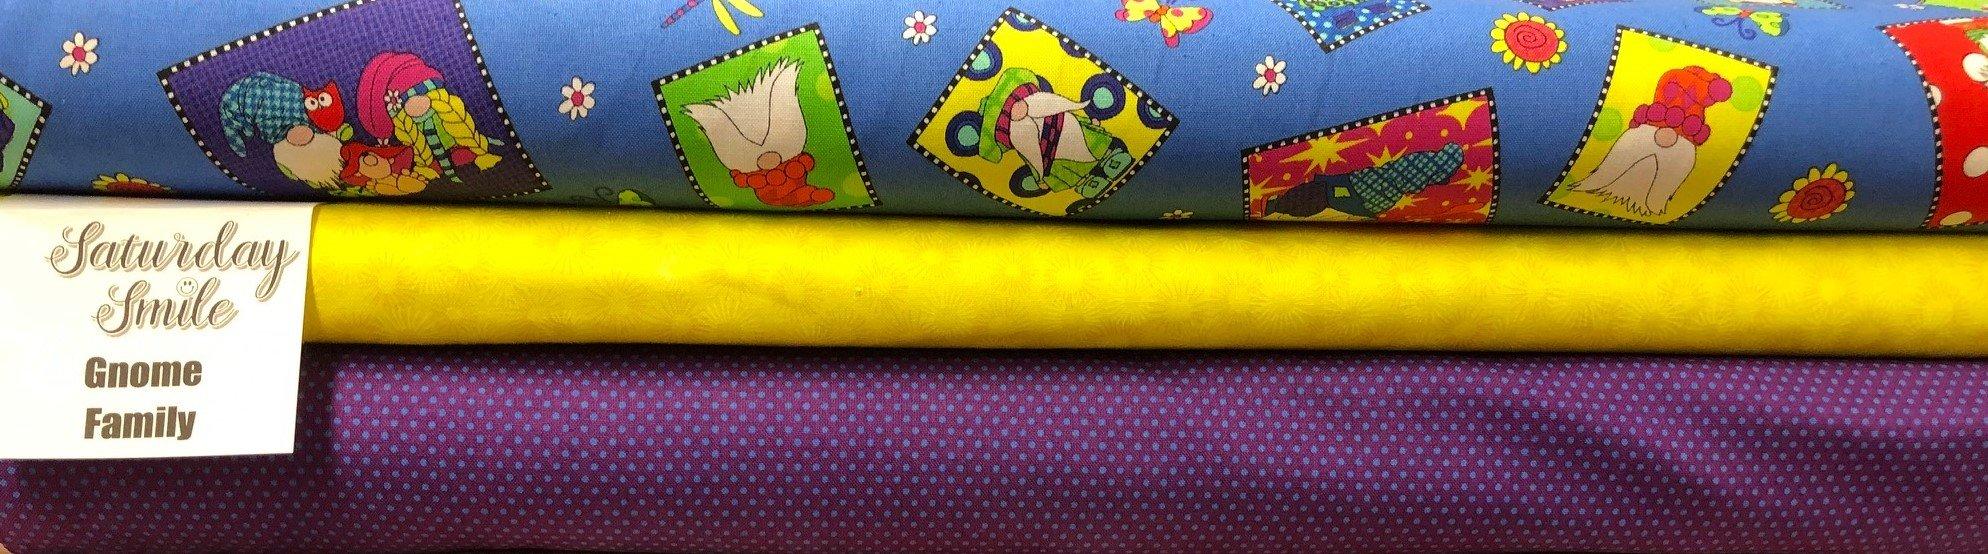 Gnome Family 3-Yard Quilt Kit